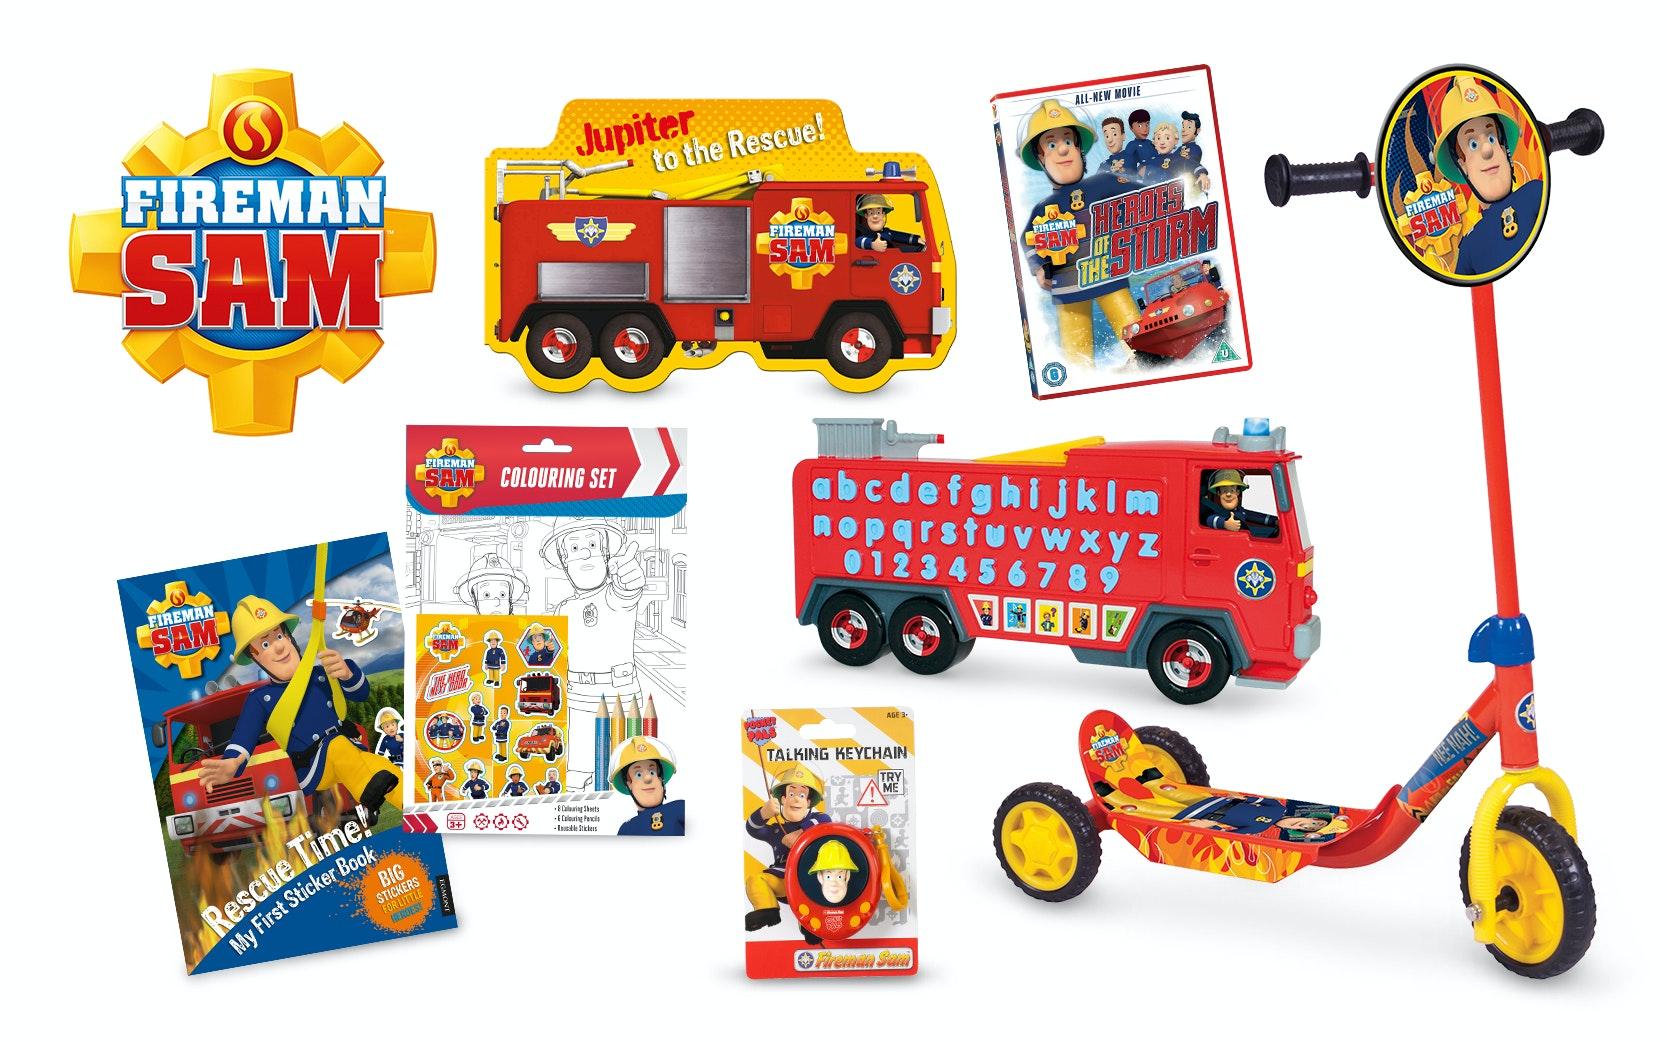 352383 02 fireman sam product images 2 c1